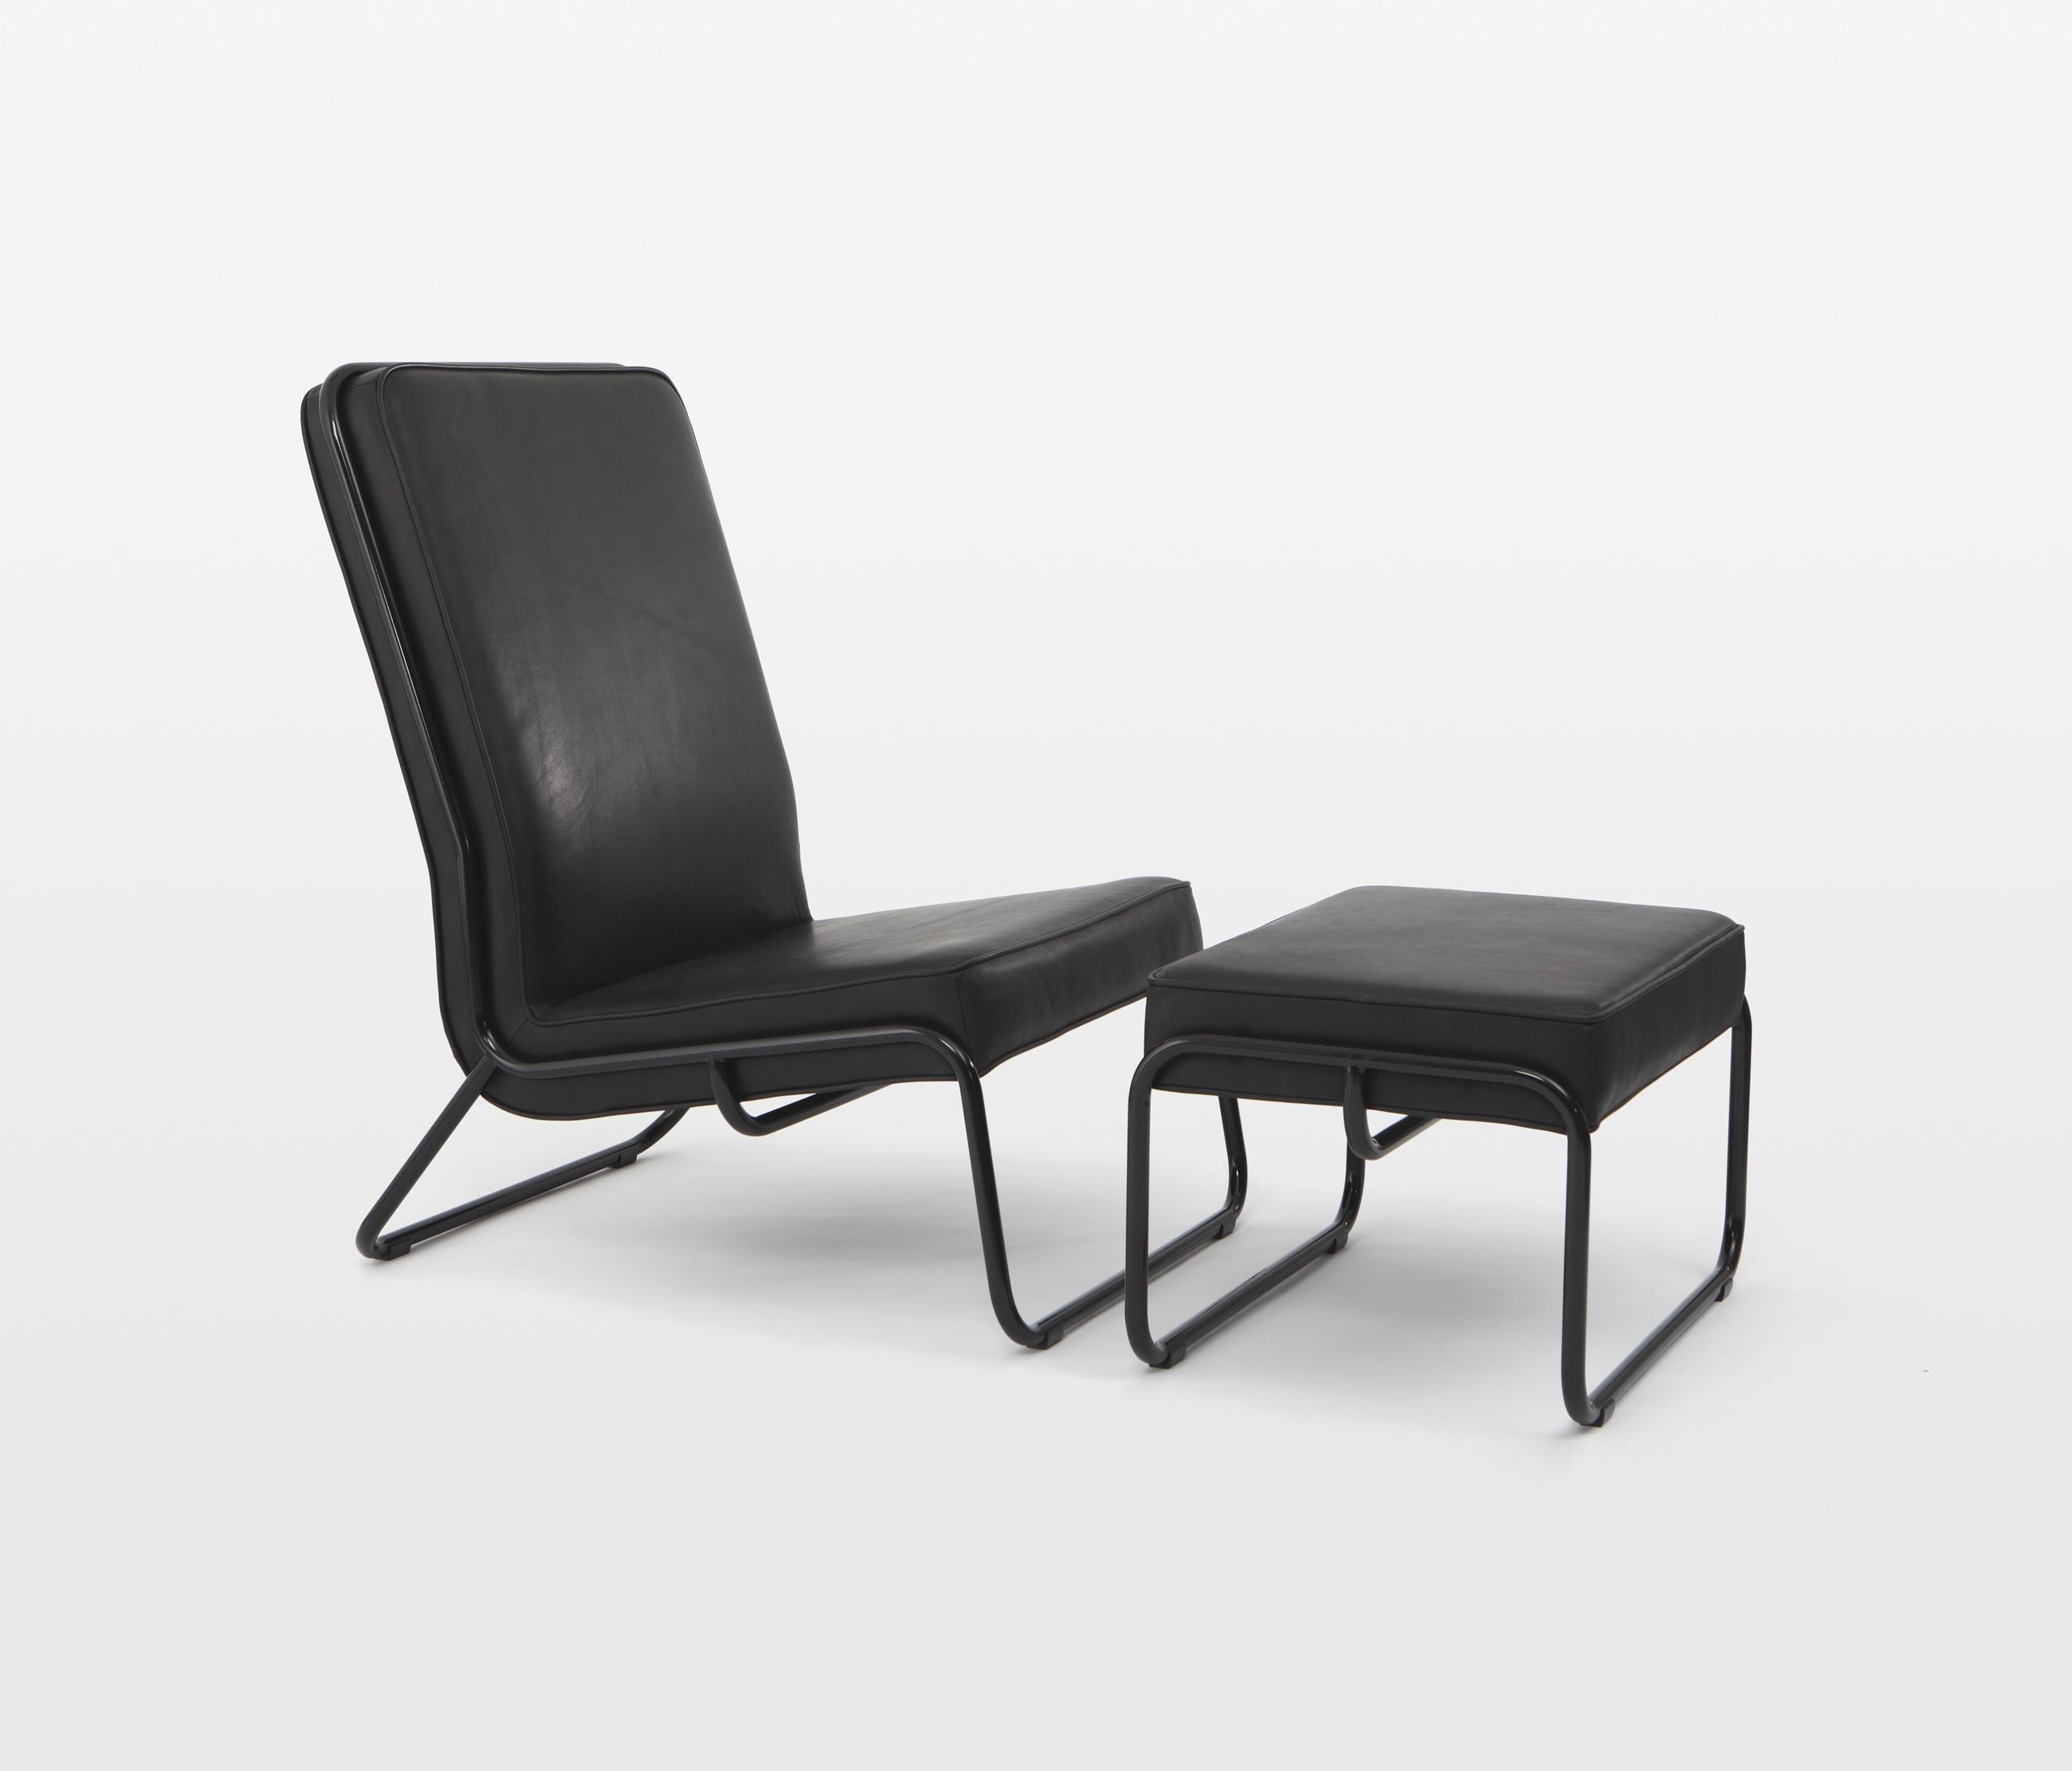 intex ultra lounge chair and ottoman folding wooden directors plans mit hocker vital premium ausfhrung sessel und